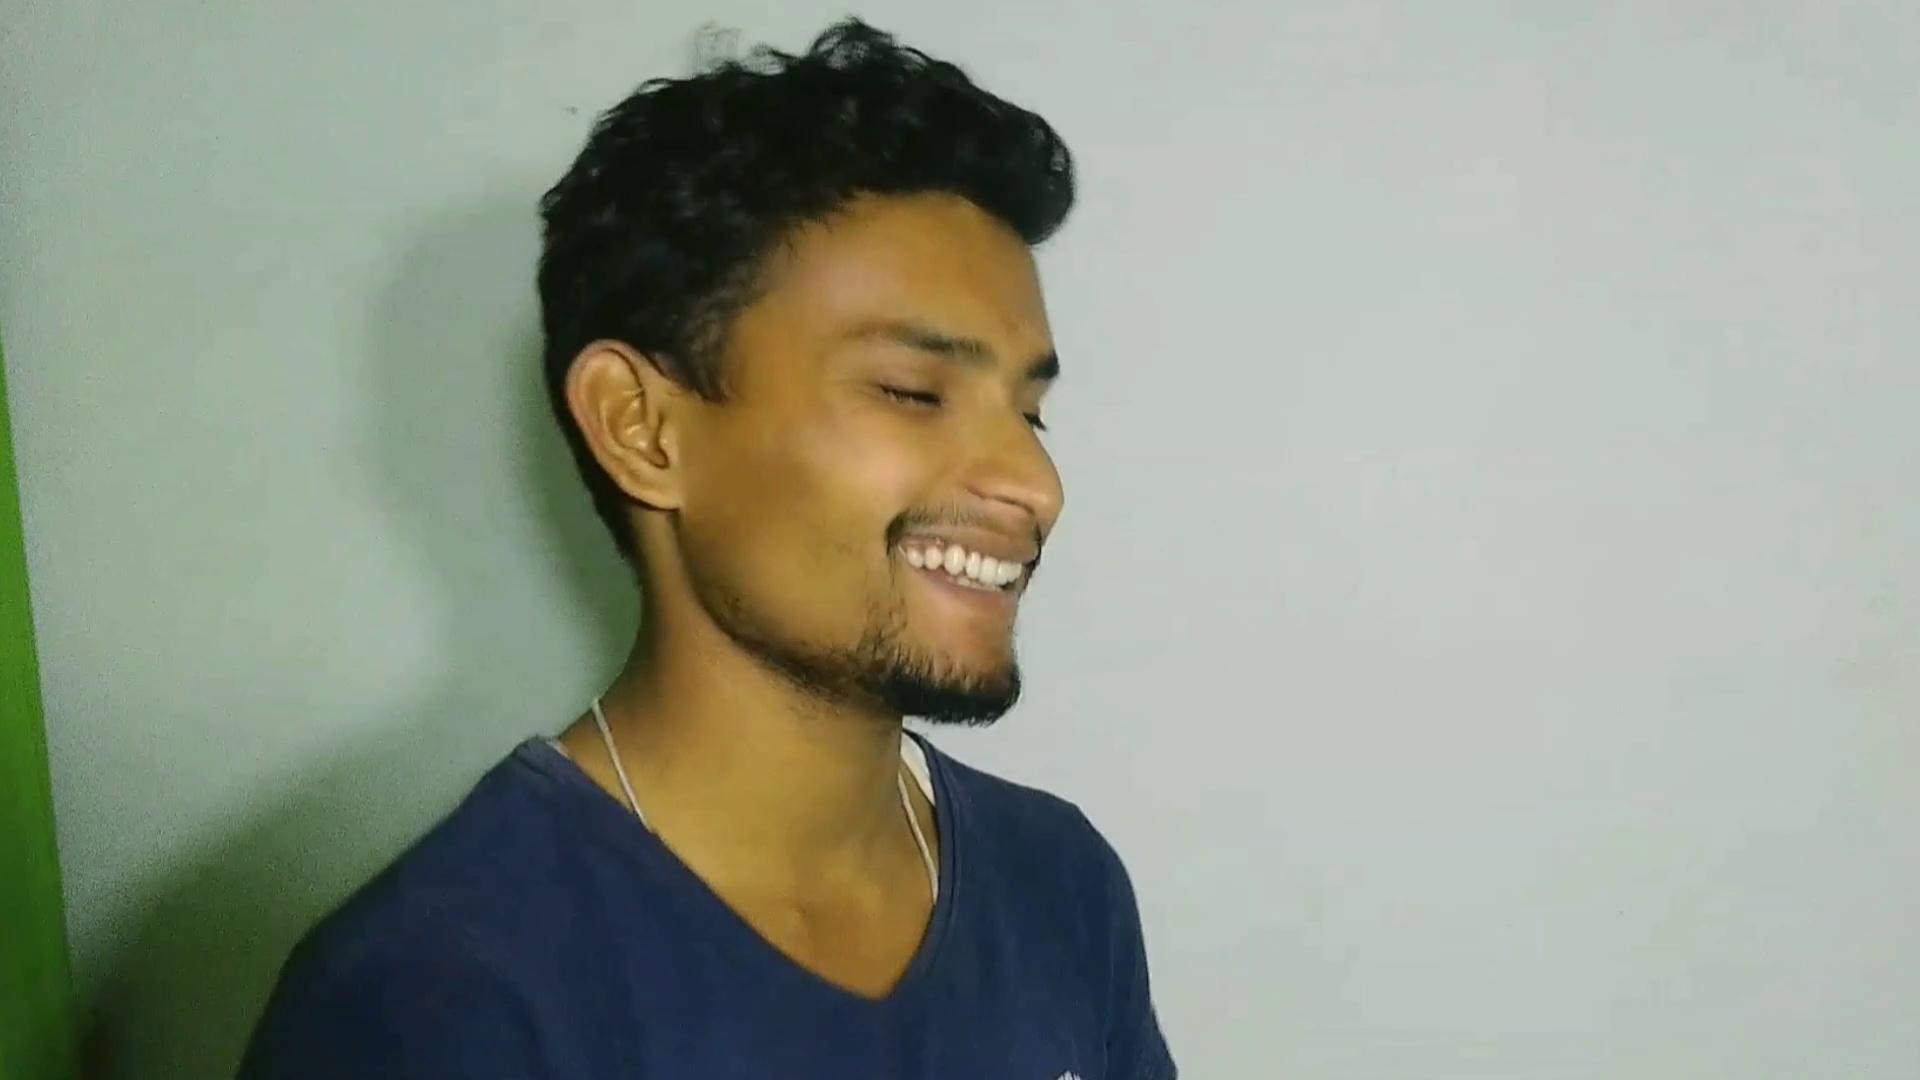 Chhattisgarhi Yoga Class || Chhattisgarhi Comedy Video New || Cg Comedy videos By tech fun|| cg comedy || comedy video ||  cg comedy video